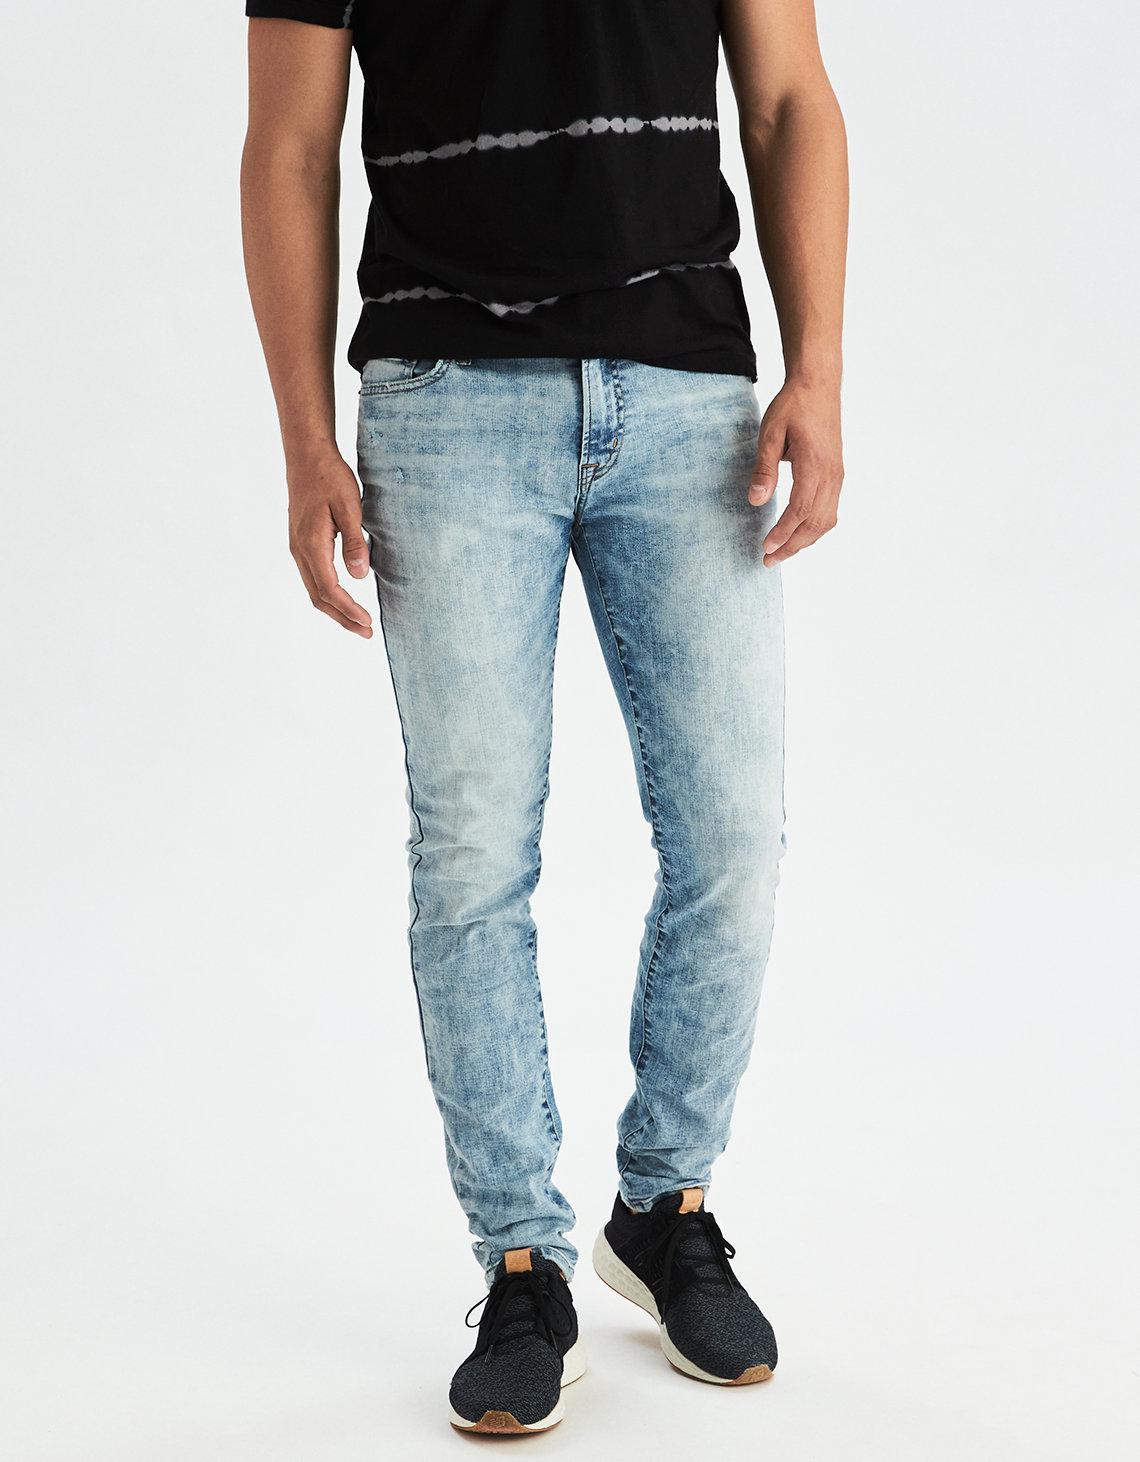 American Eagle Blue Ae 360 Extreme Flex Skinny Jean for men